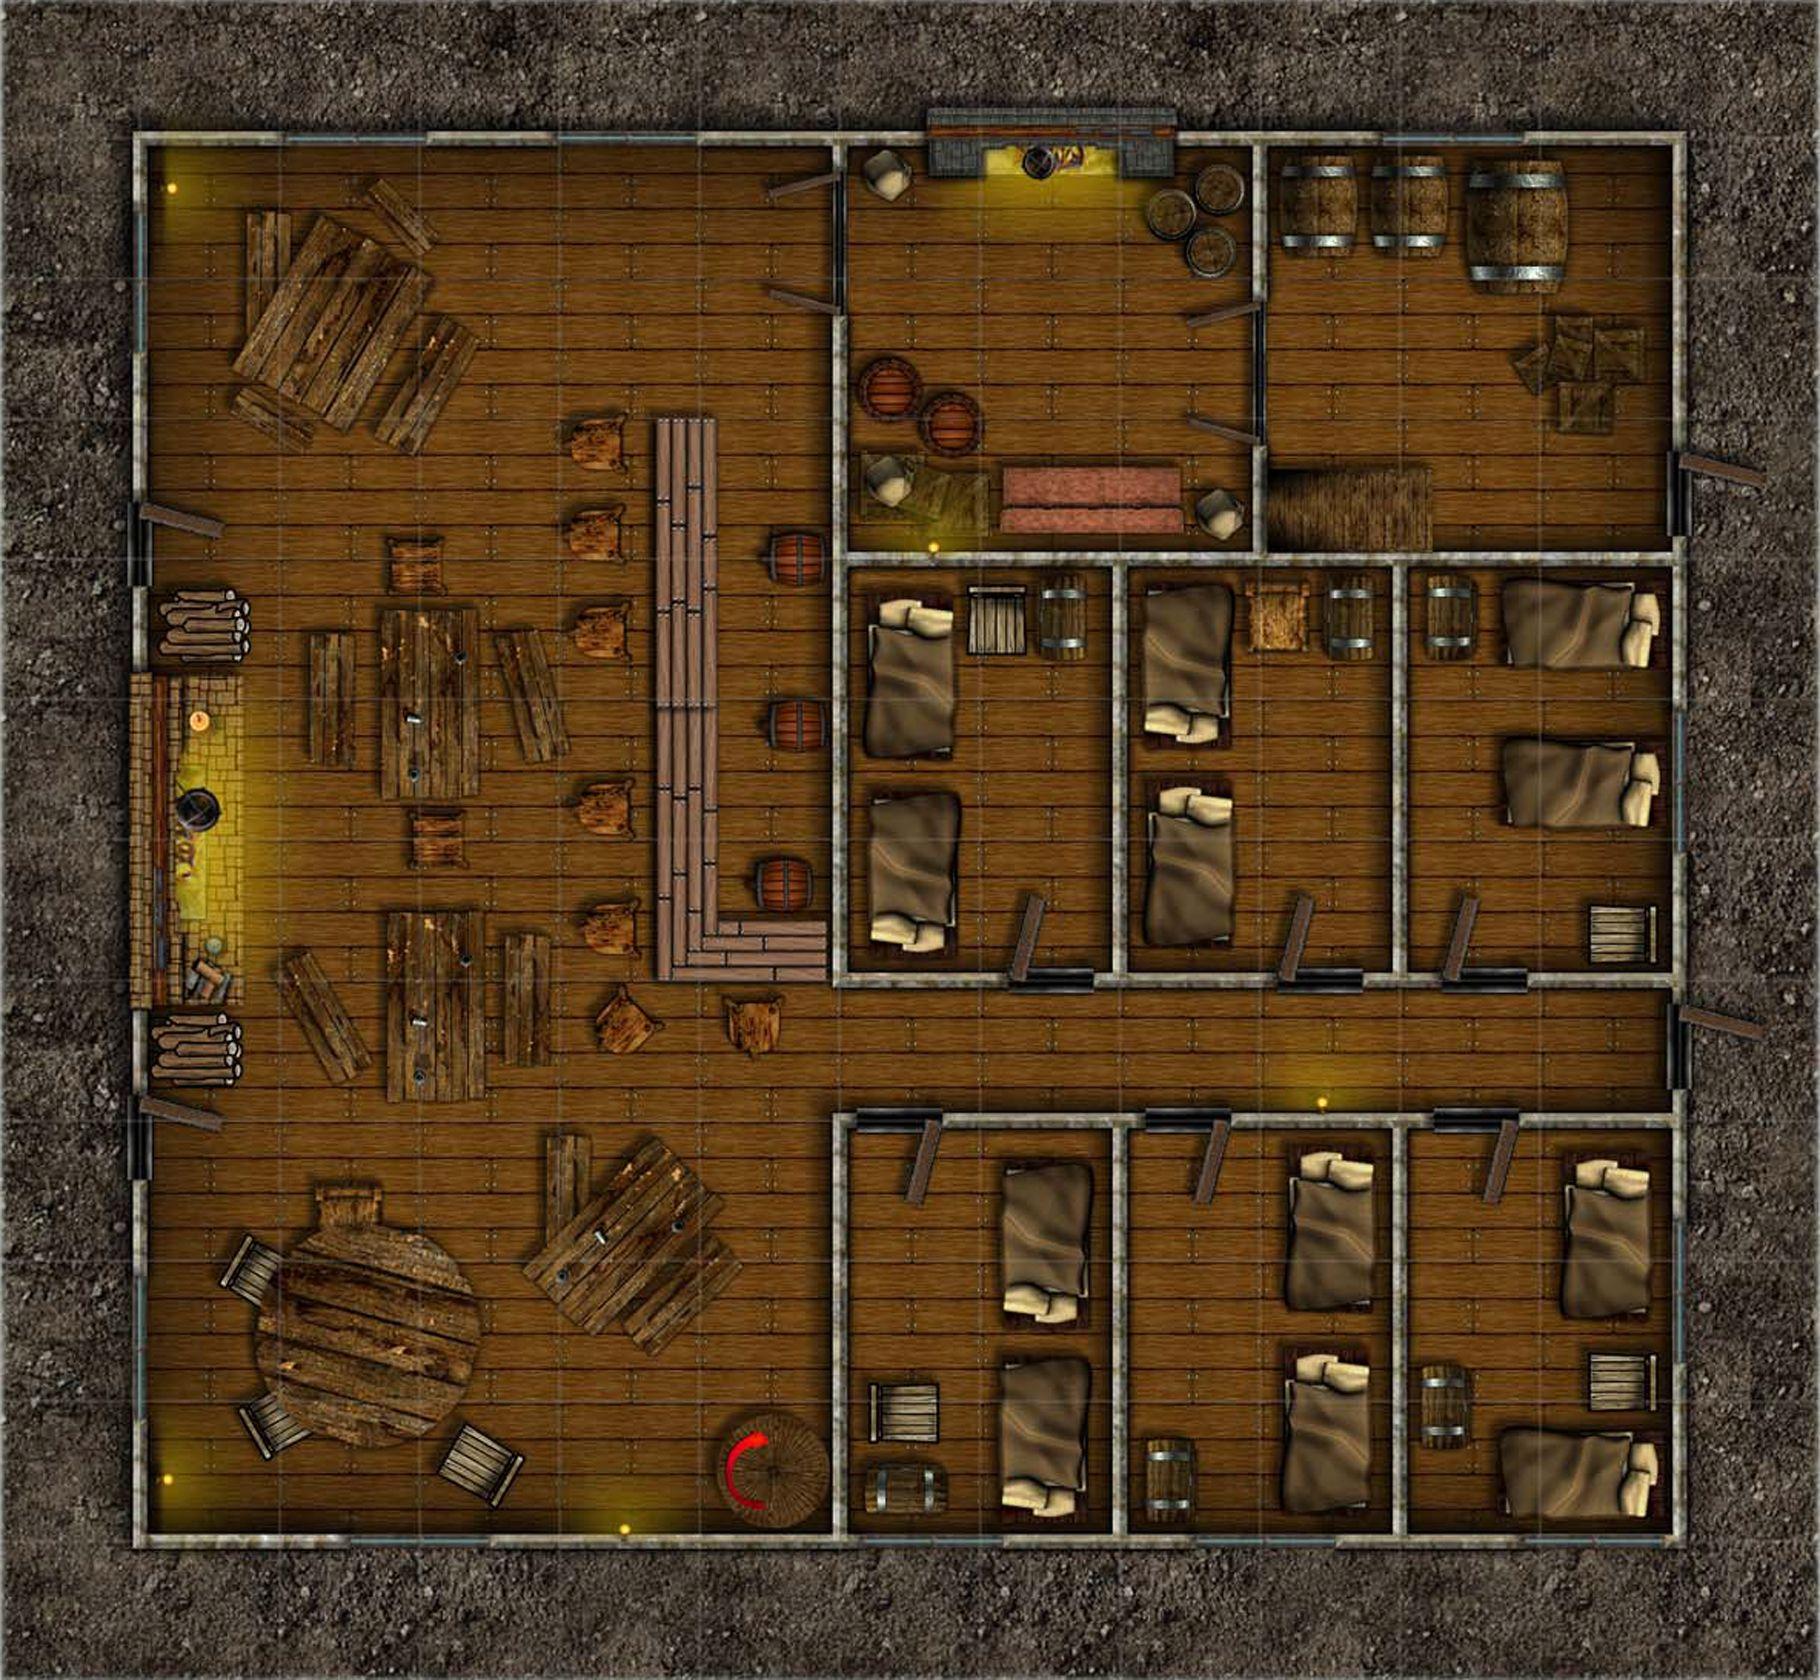 Wraftons inn fantasy map medieval fantasy fantasy battle building map tabletop rpg